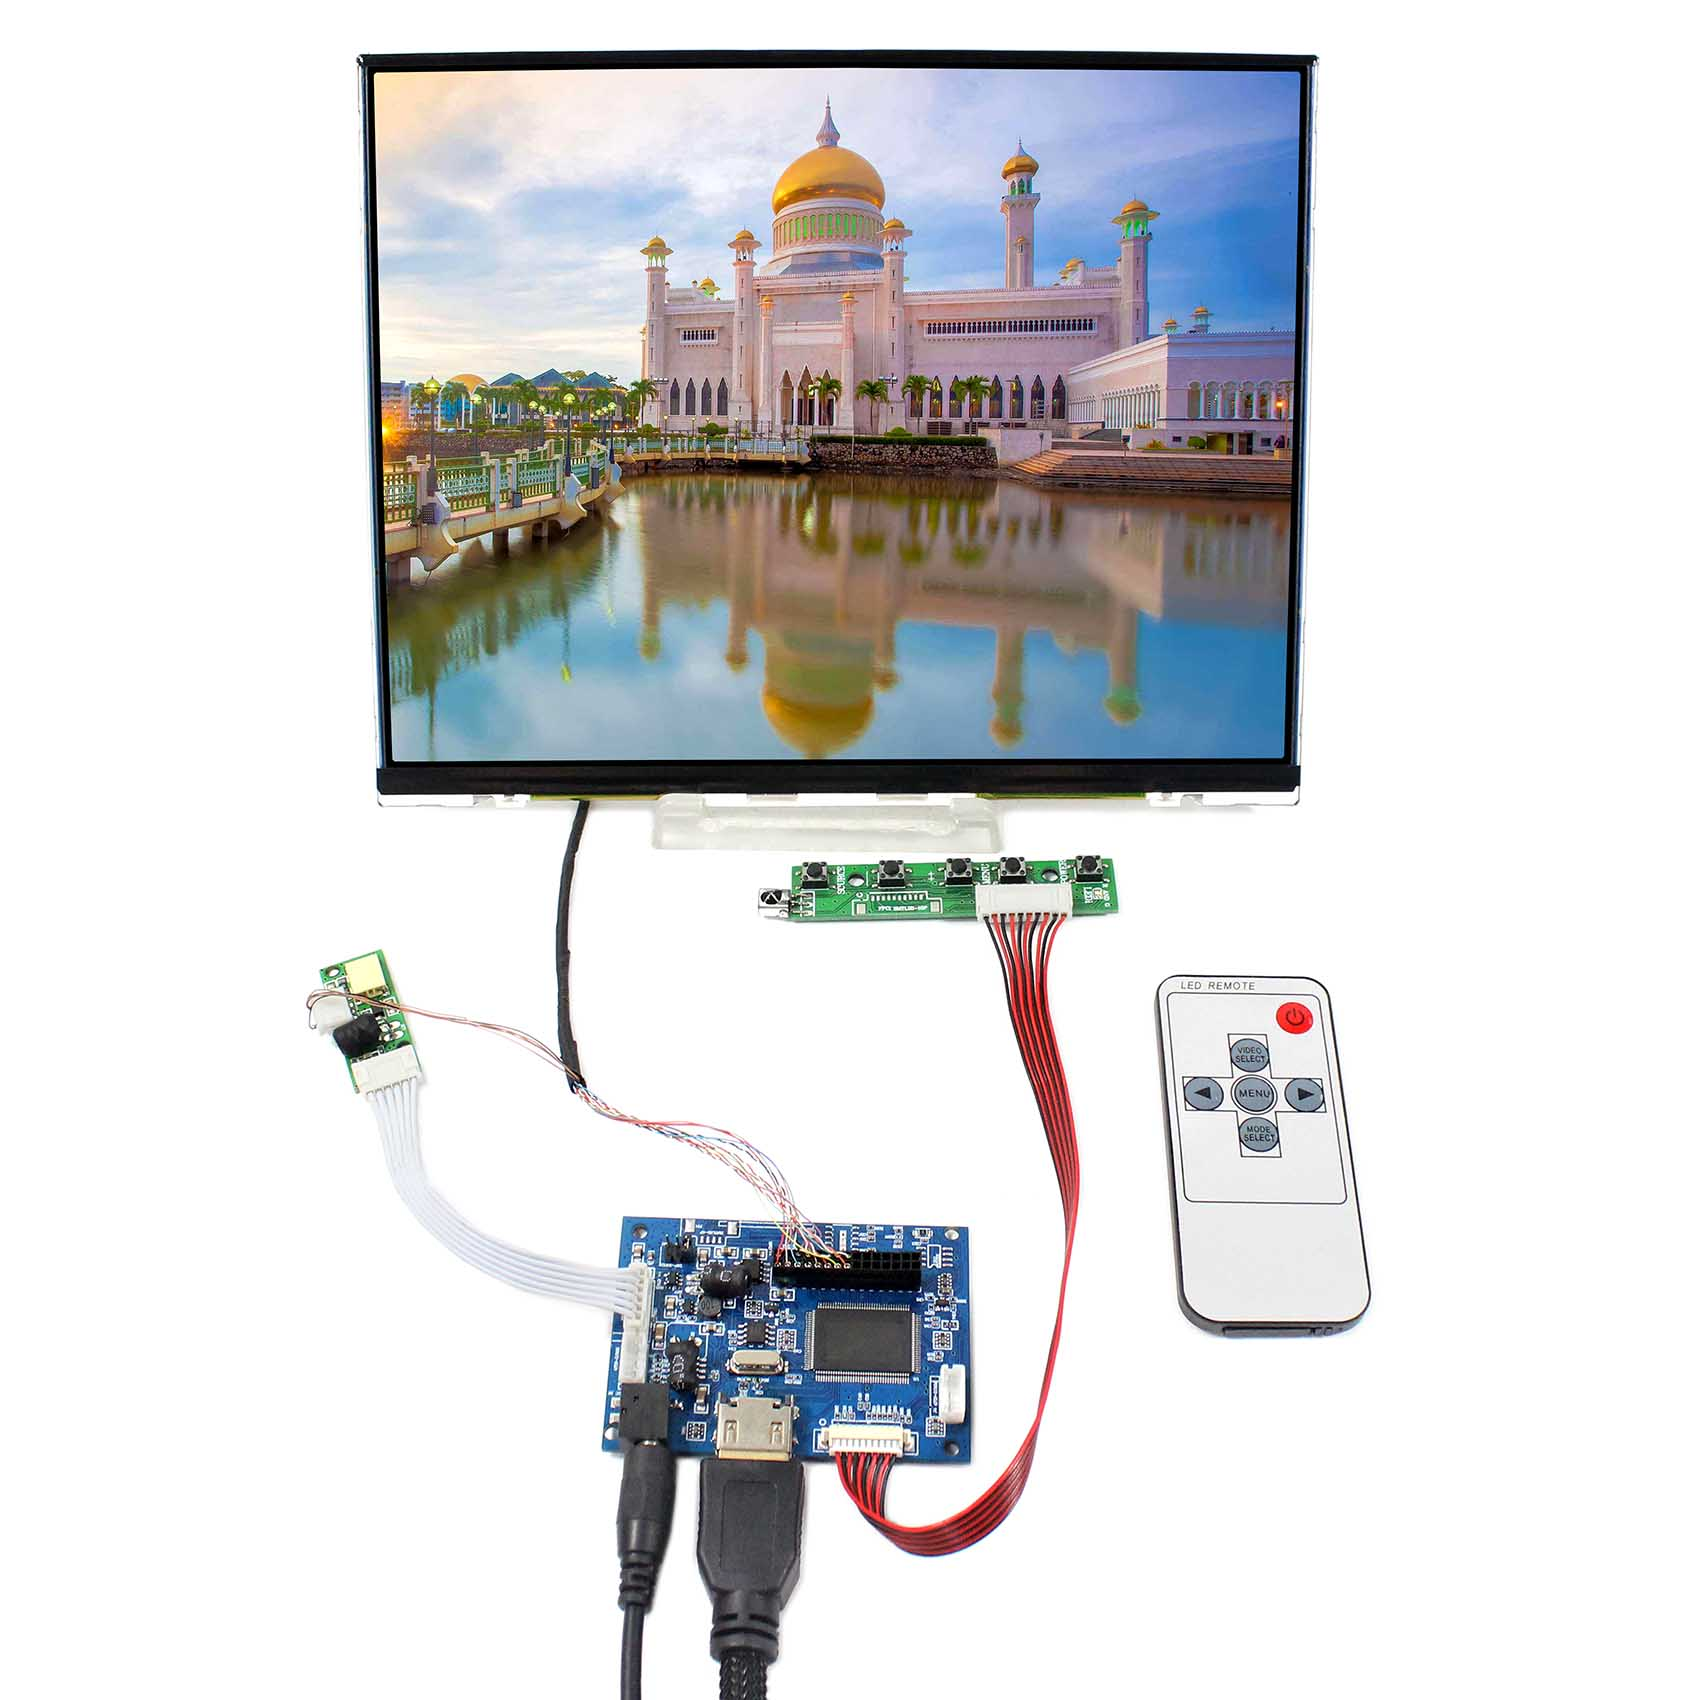 "10.4"" ips LCD  1024x768  Screen  LTD104EDZS  with HDMI controller board"